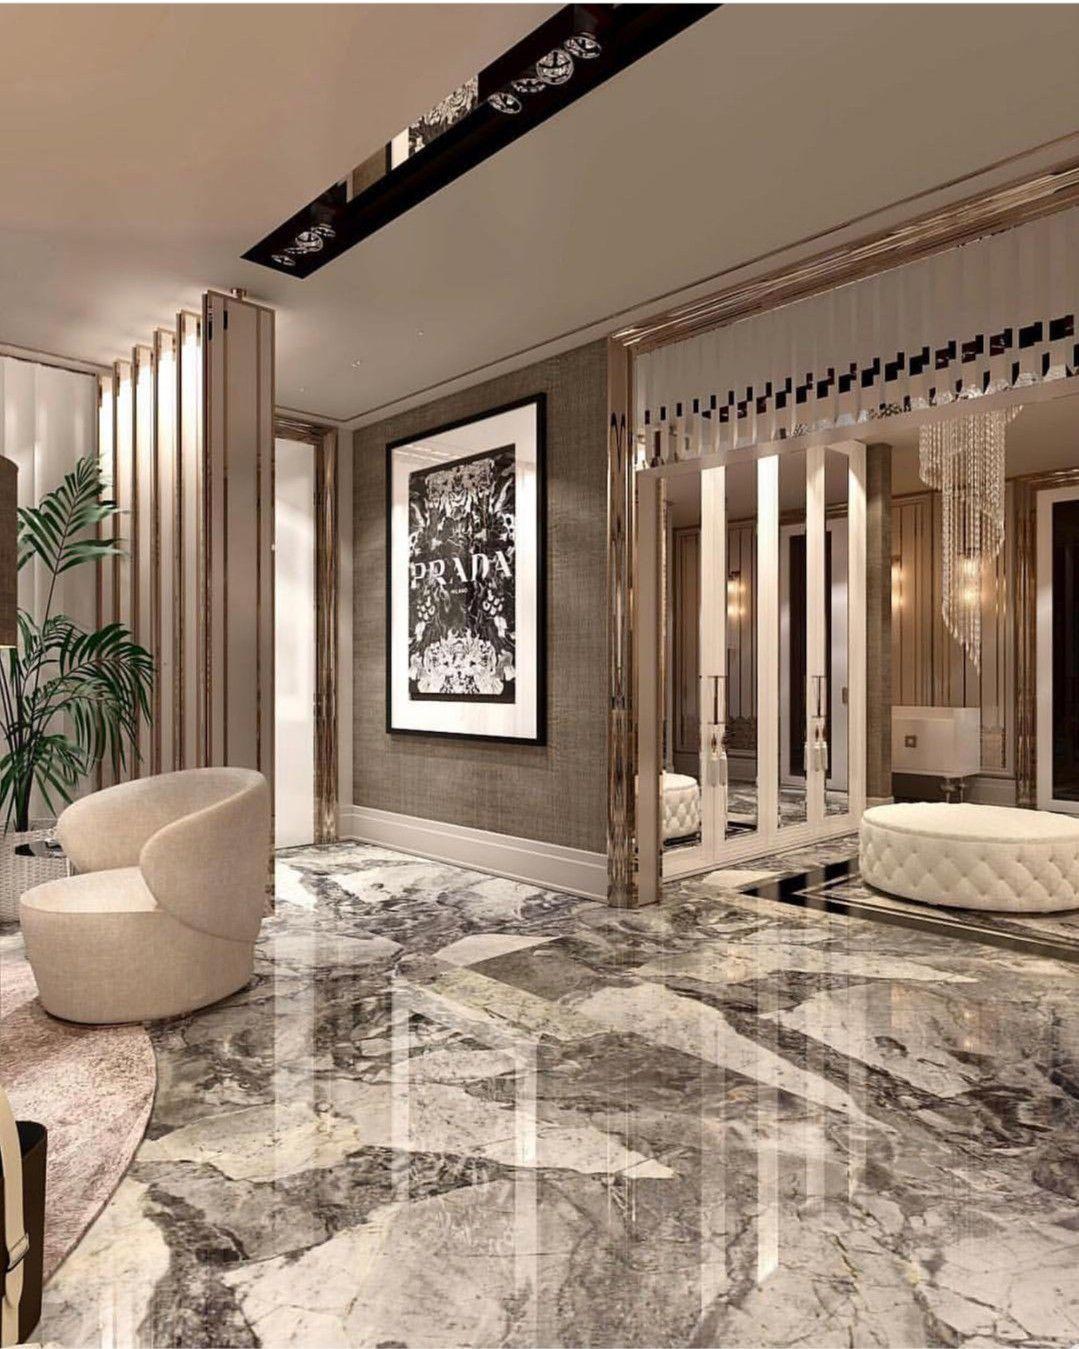 Luxury Living Room Design Image By Phoebe Jules On Luxury House